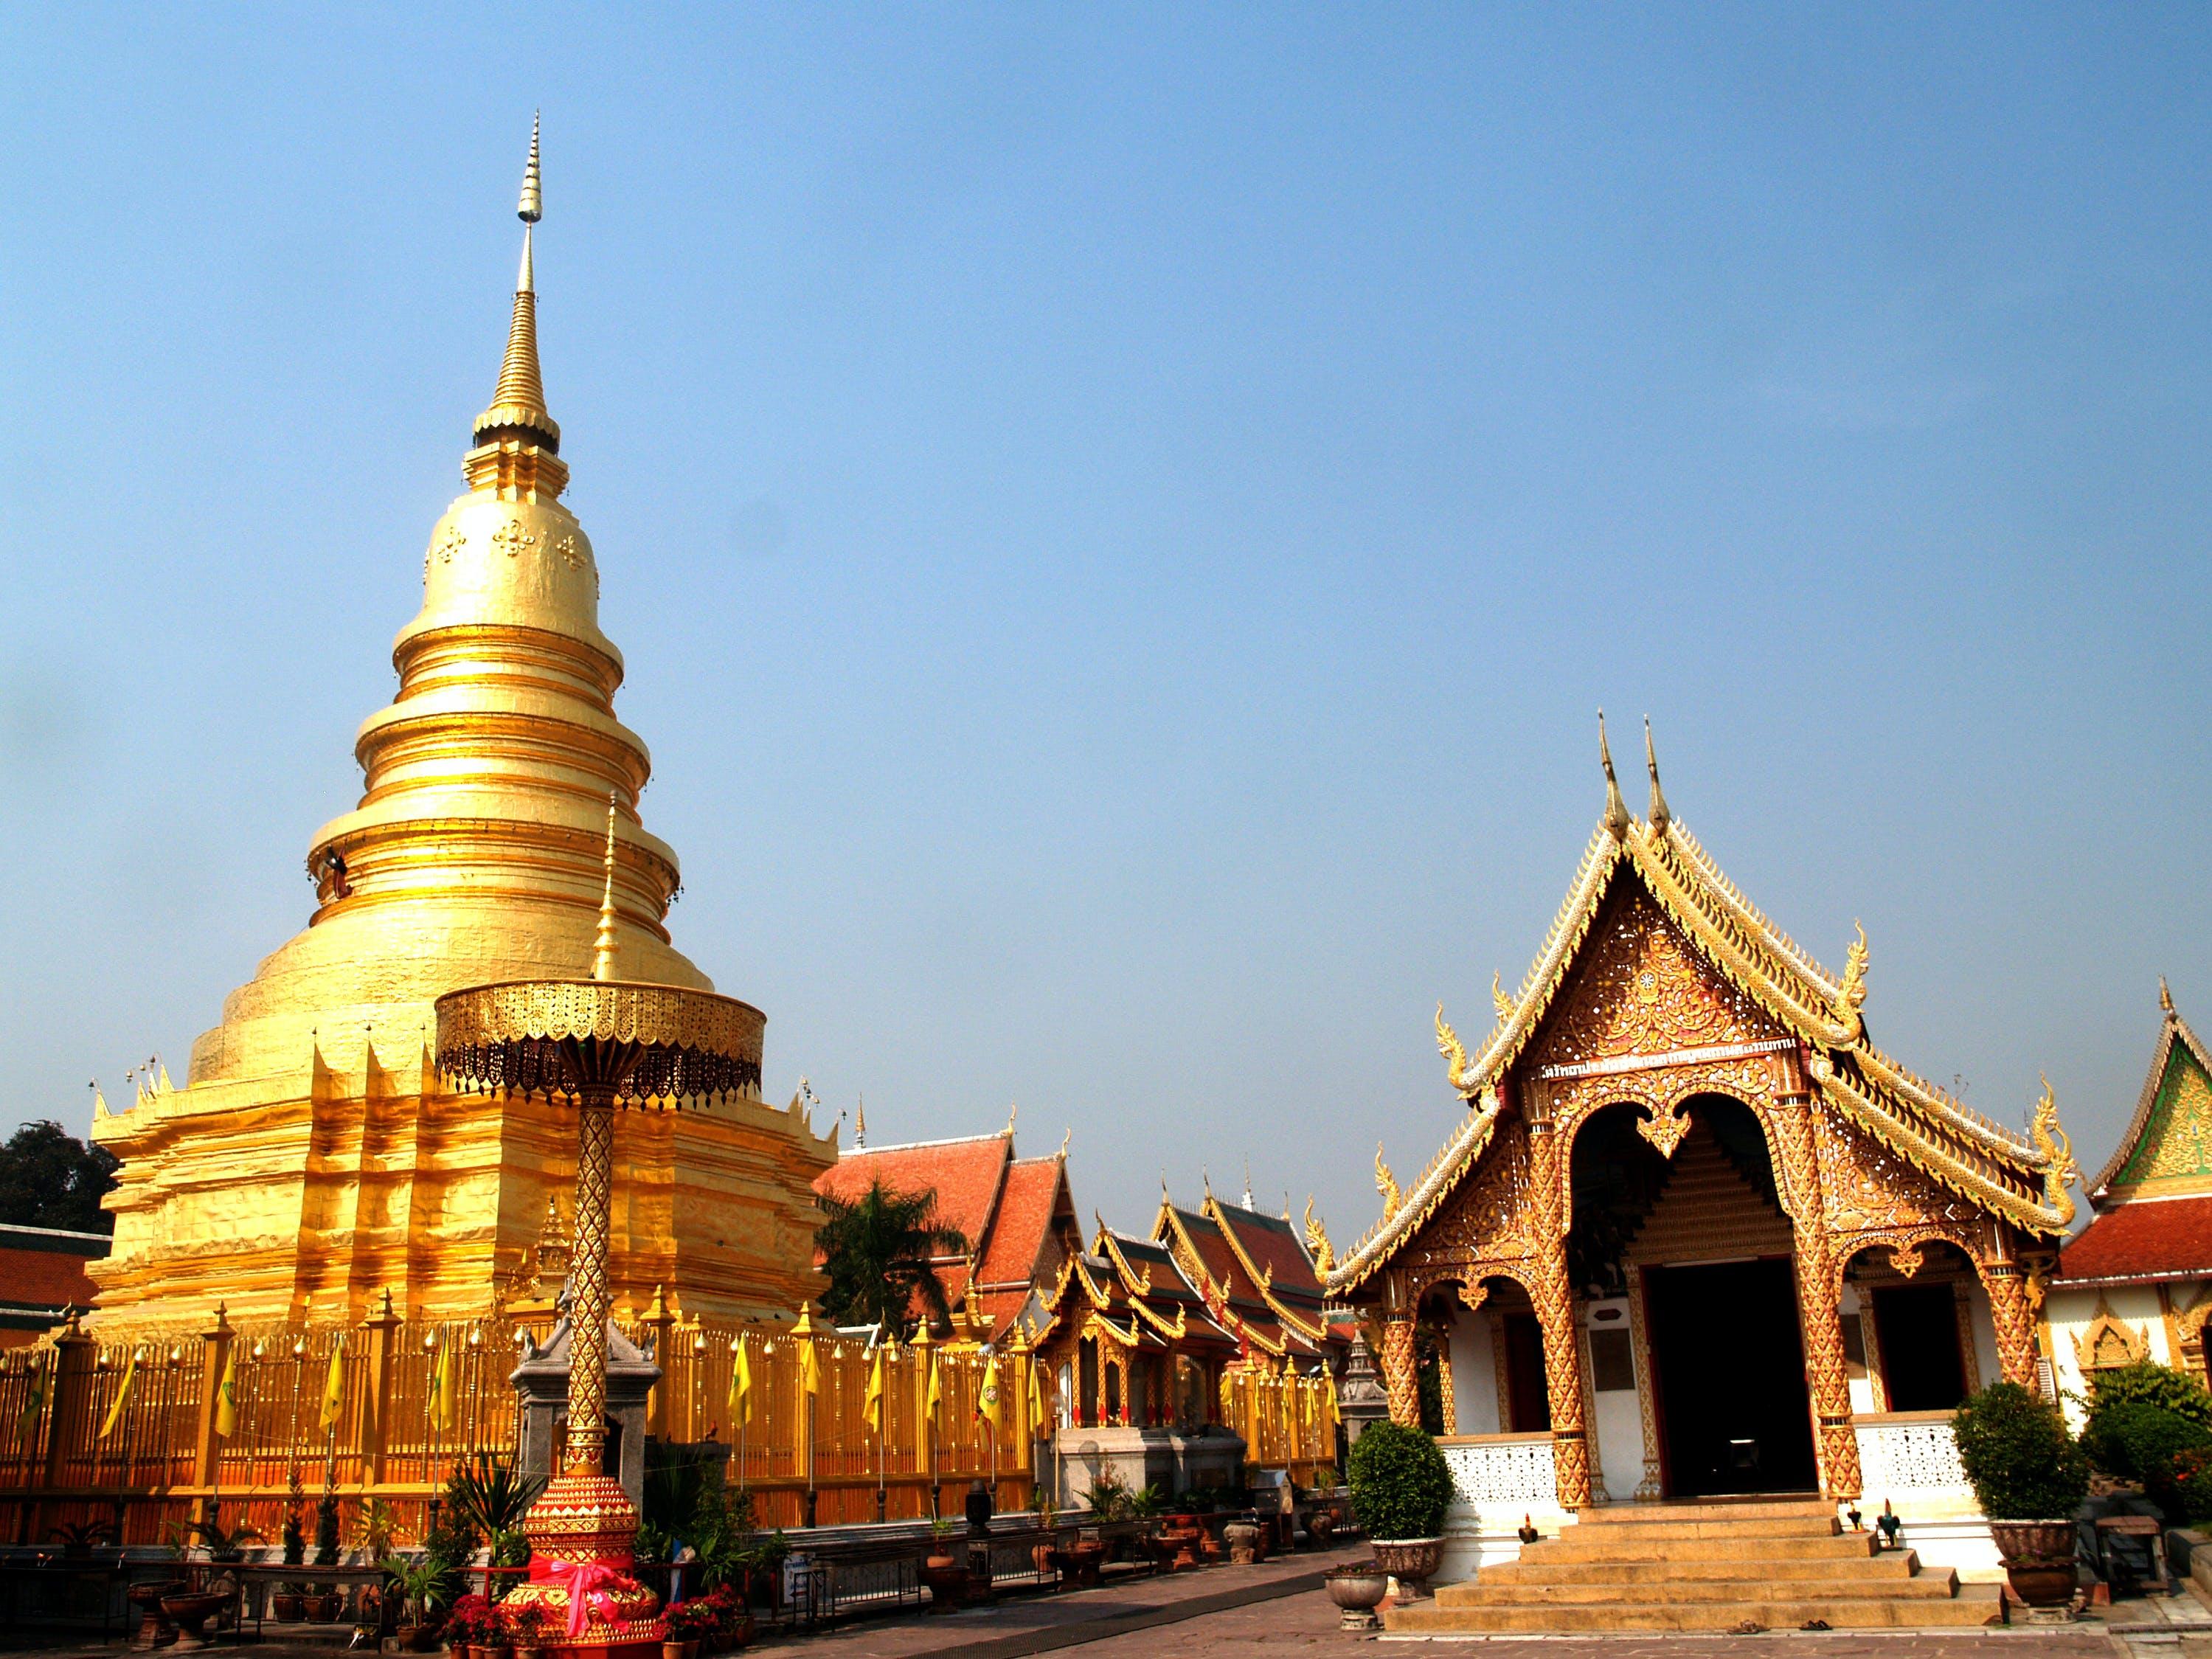 architecture, asia, Buddhism